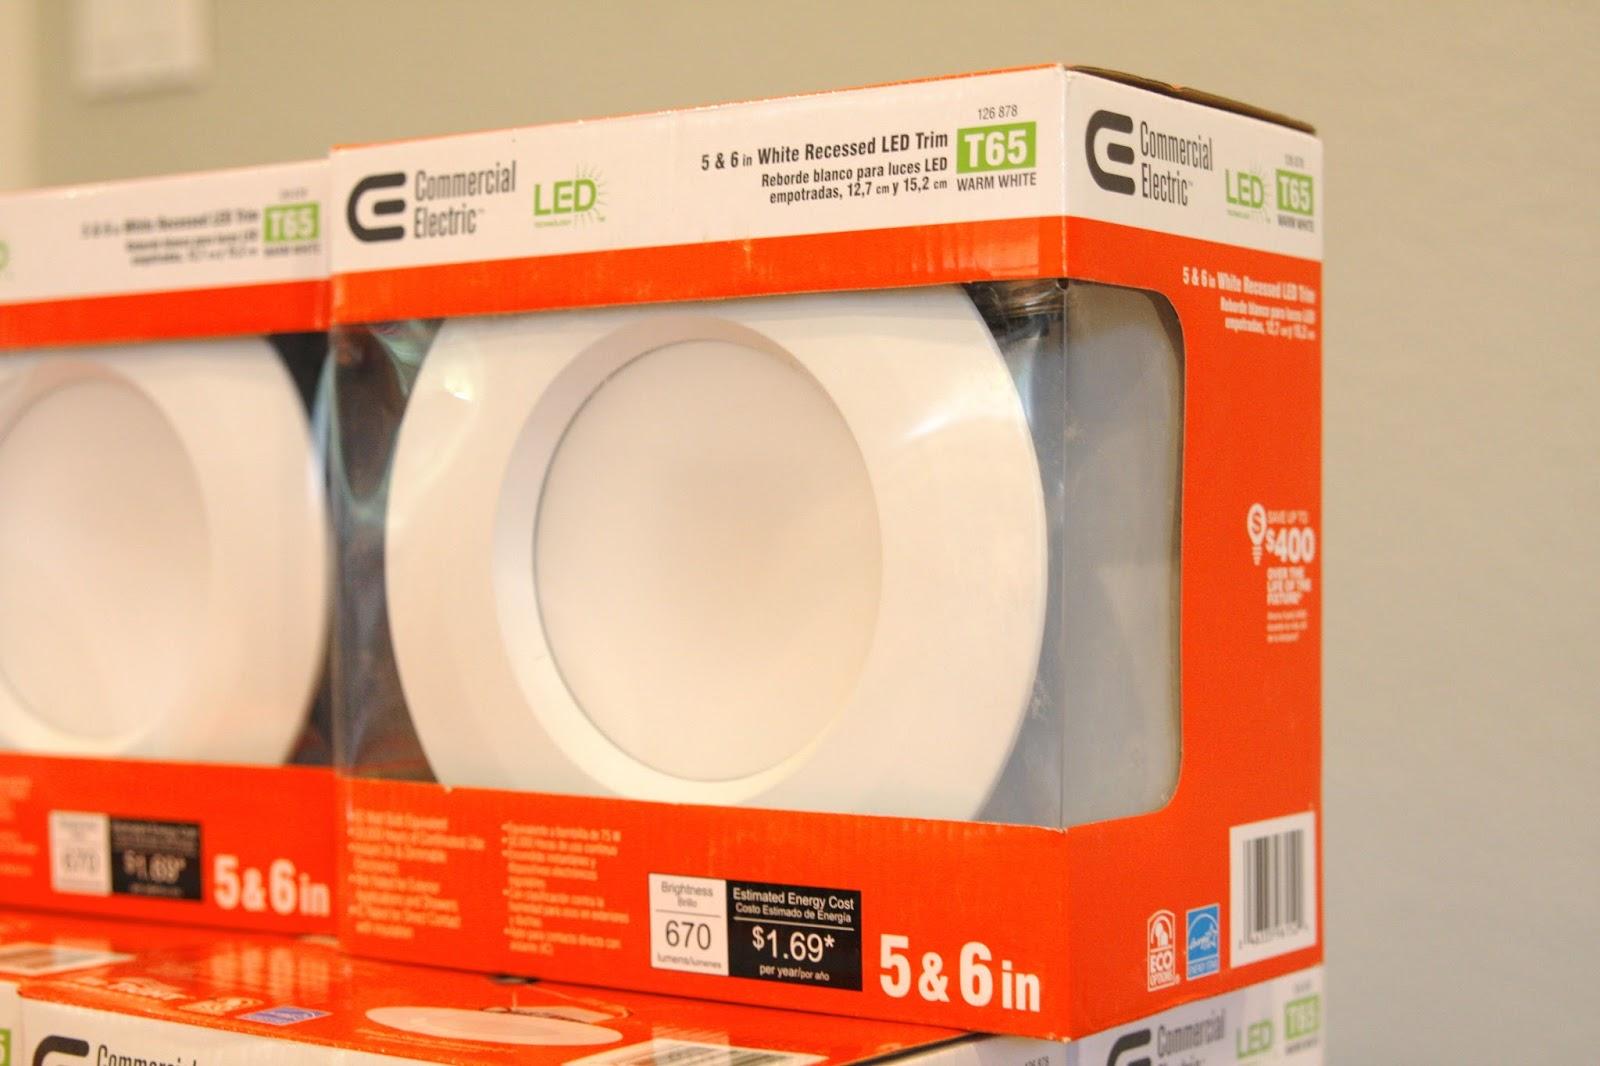 Easy DIY: How to Install LED Trim Lighting